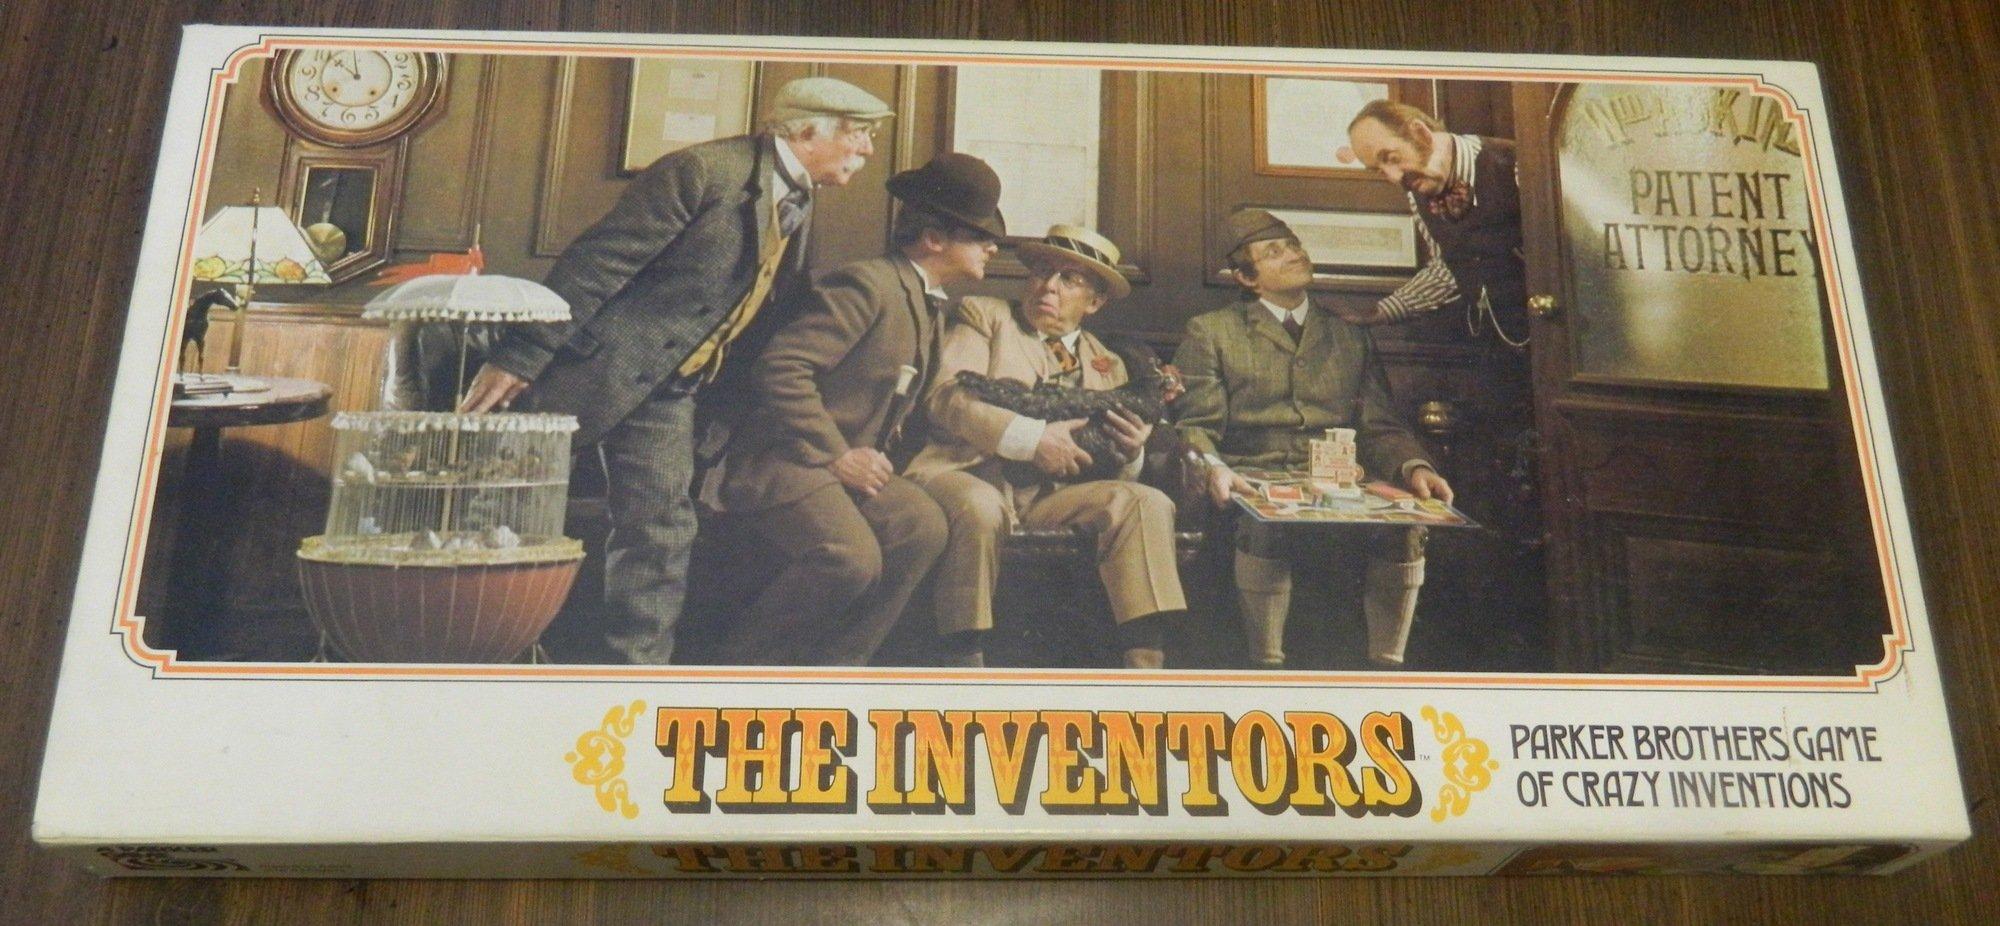 The Inventors Box